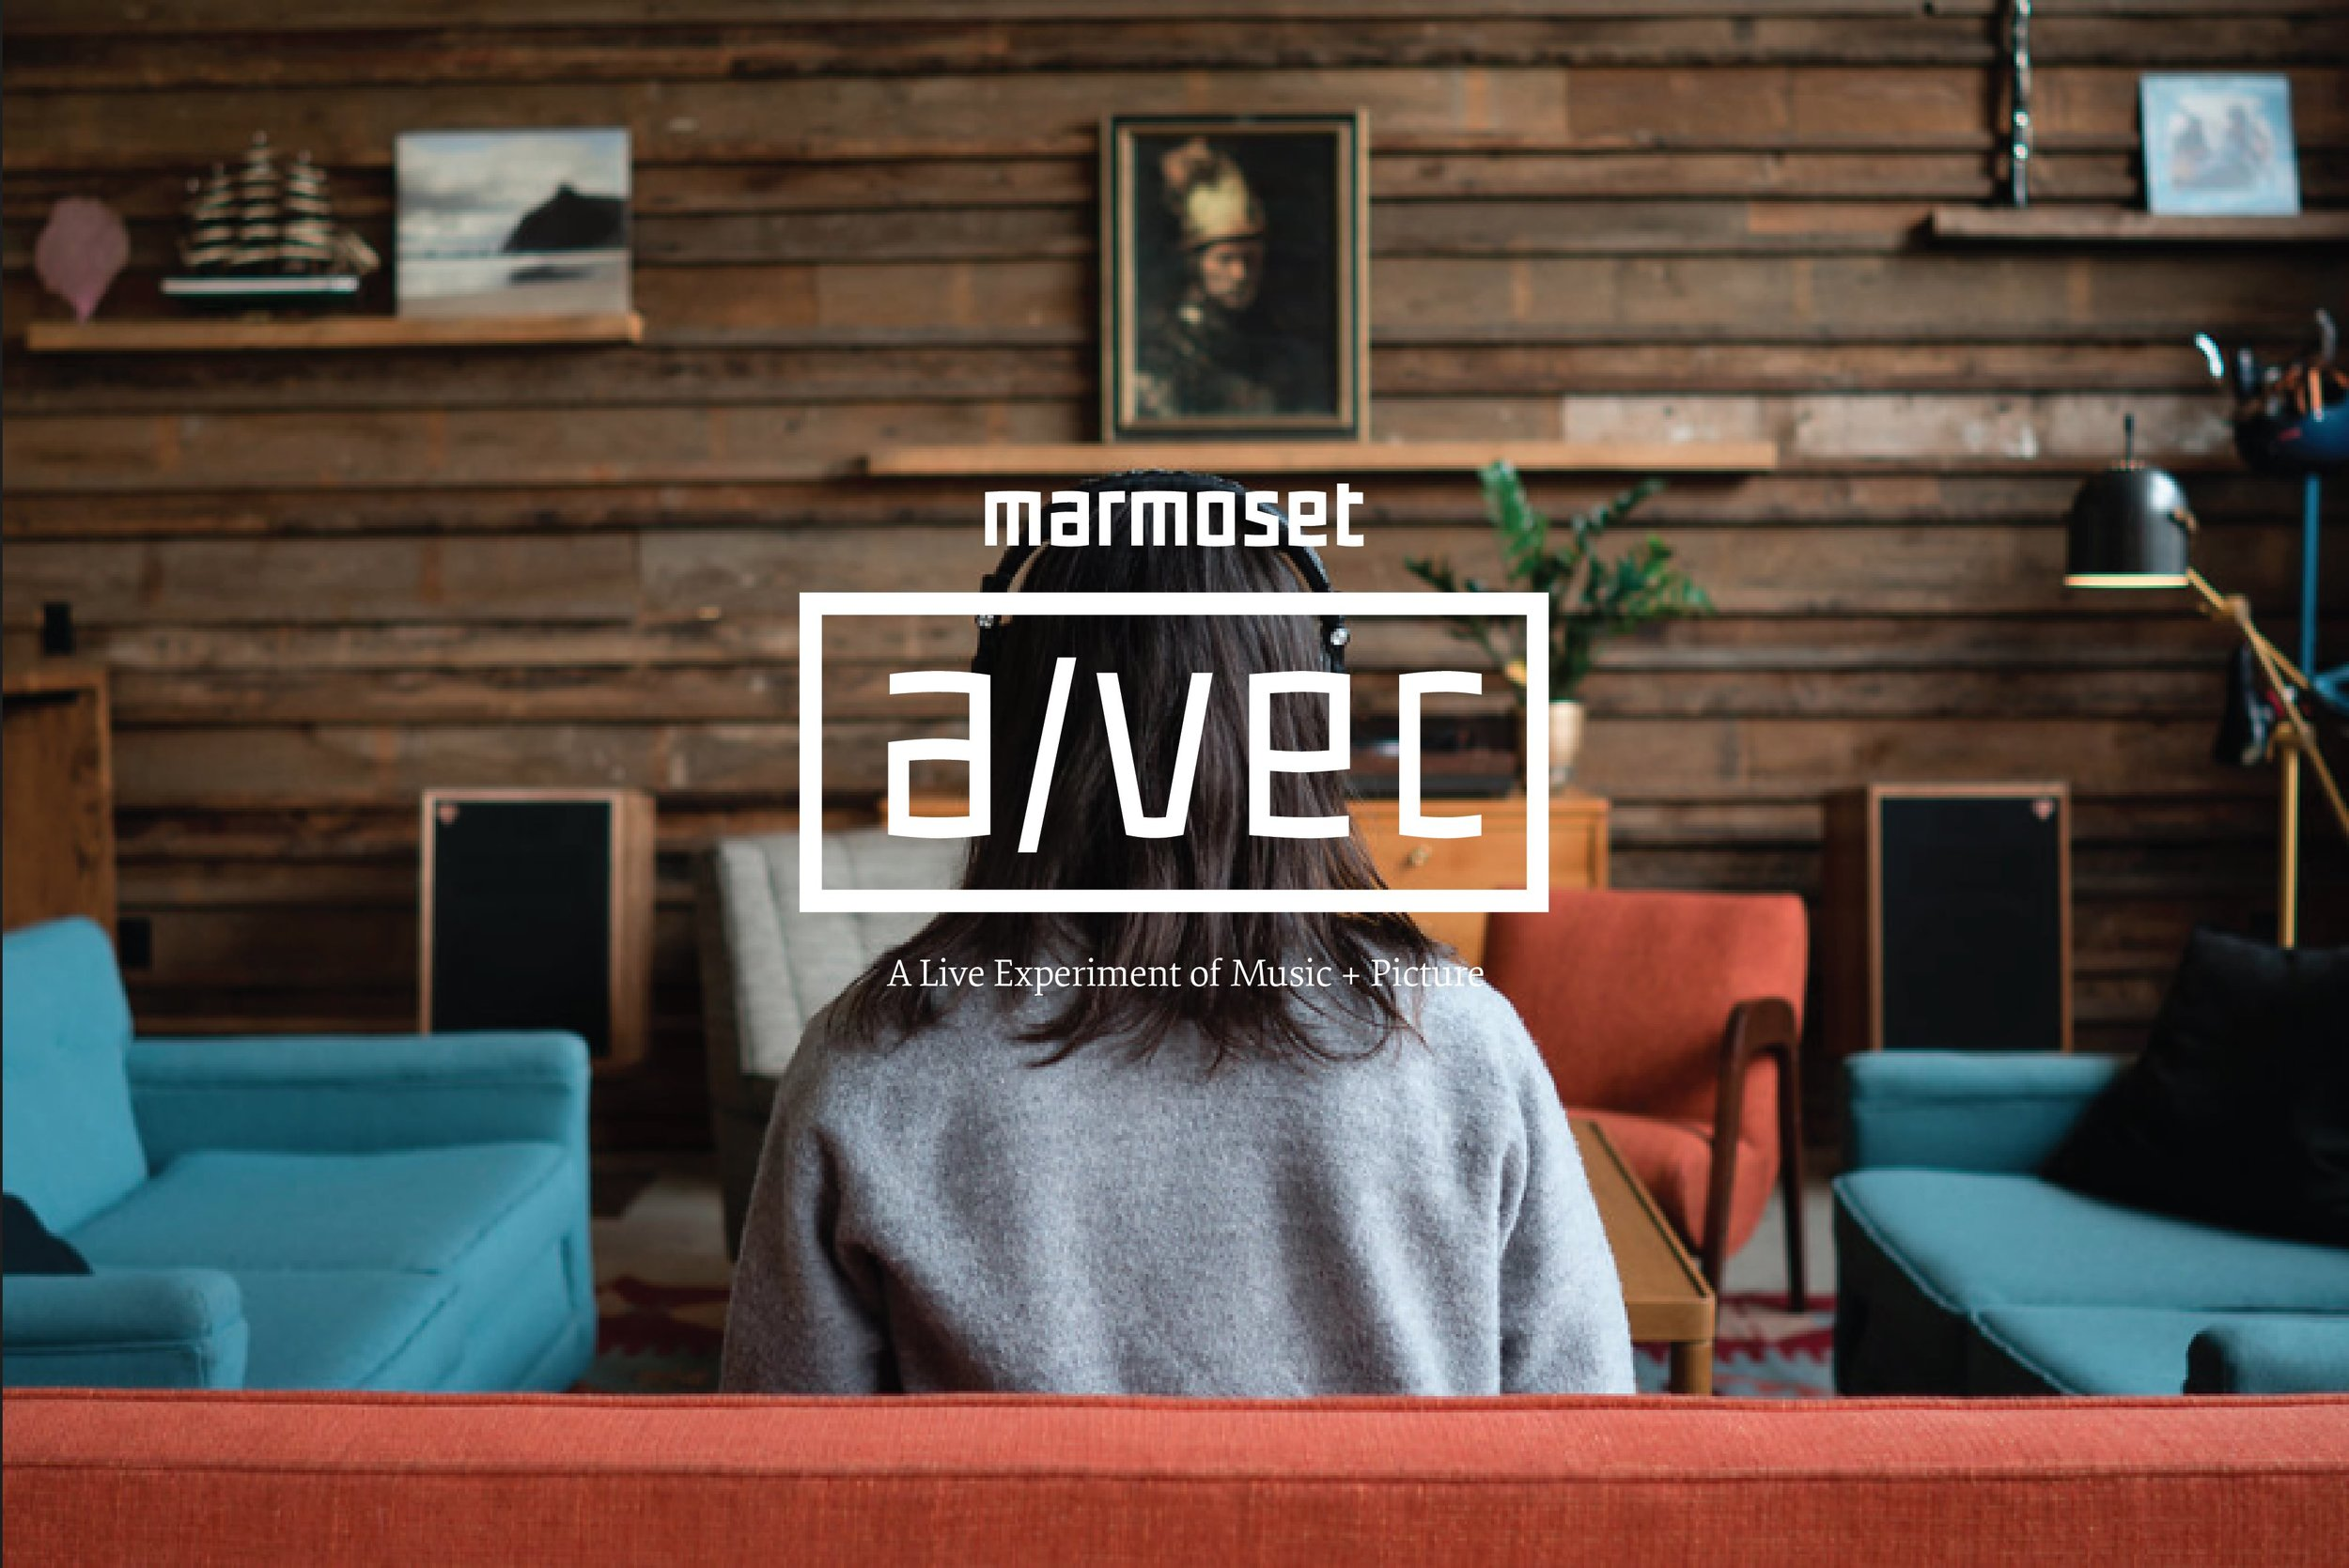 AVEC5-portland-film-music-marmoset.jpg